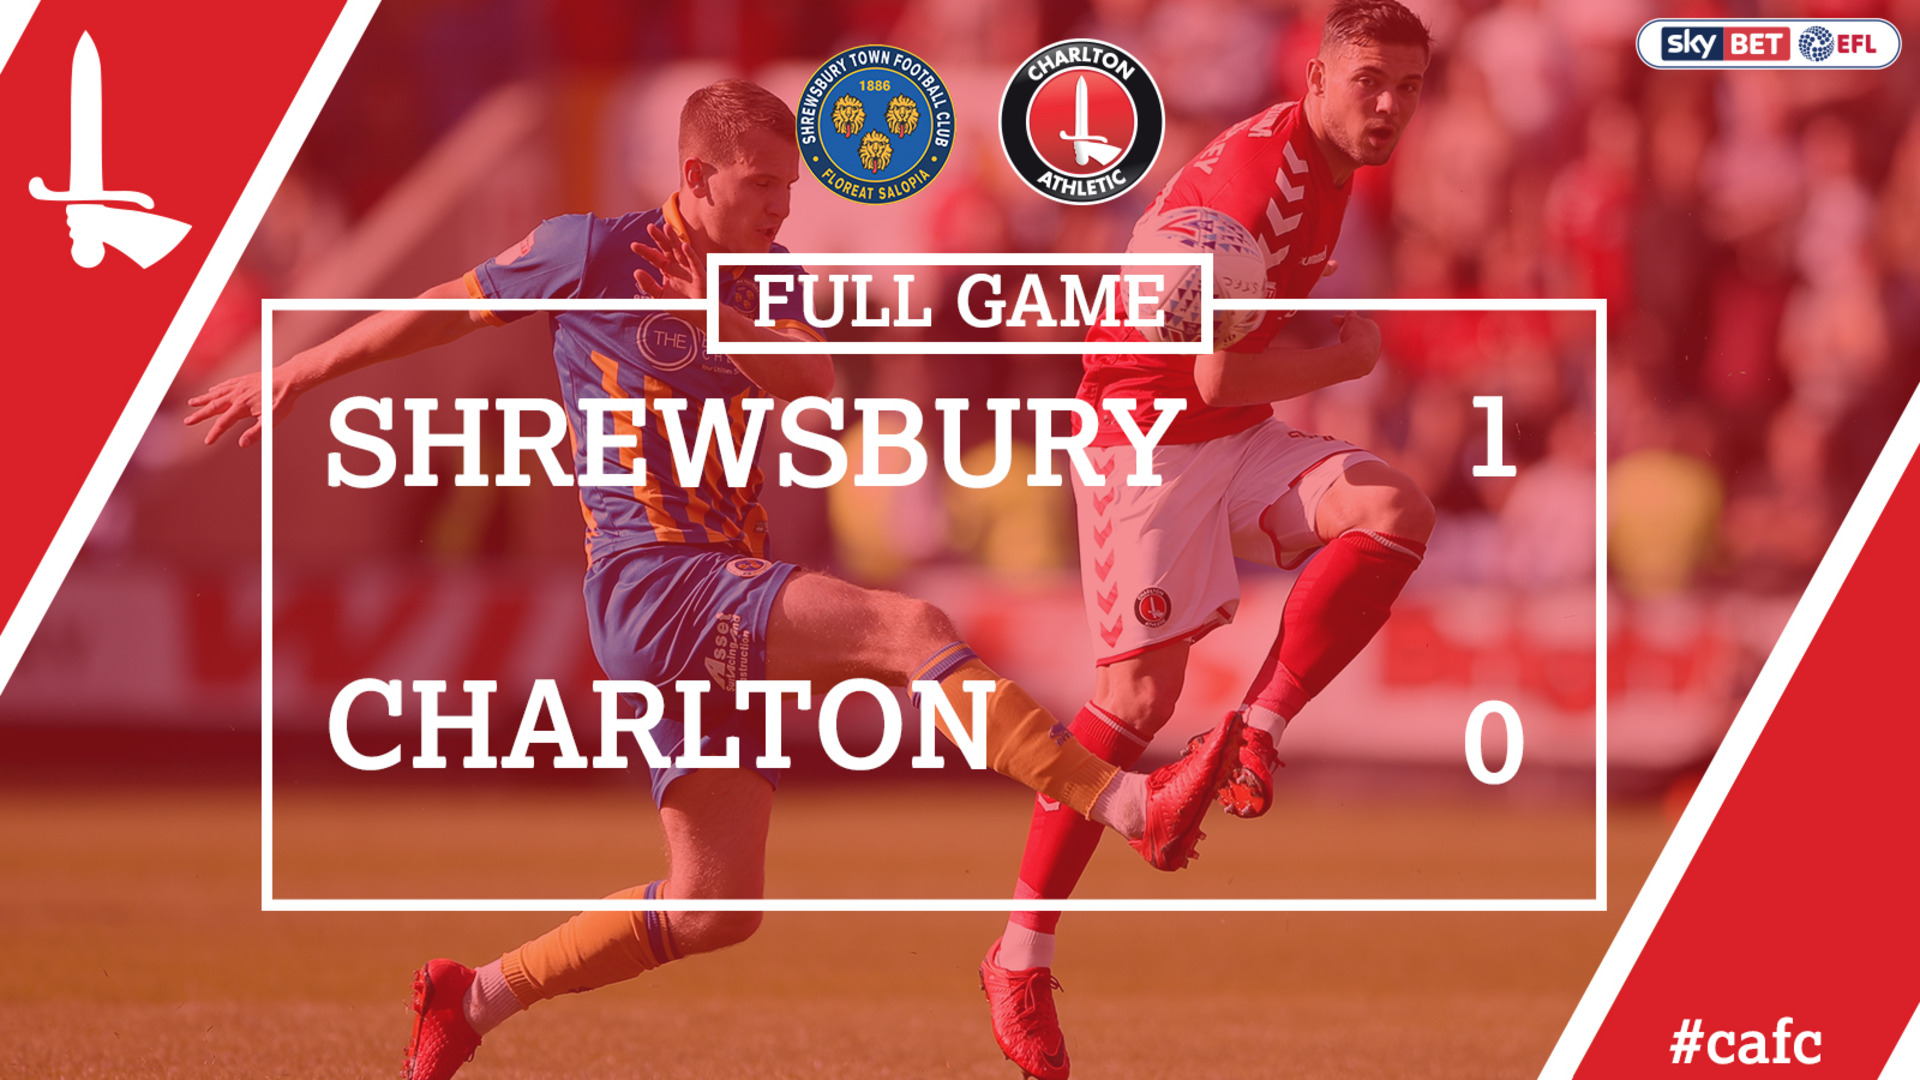 FULL GAME | Shrewsbury 1 Charlton 0 (Play-off Semi Final May 2018)